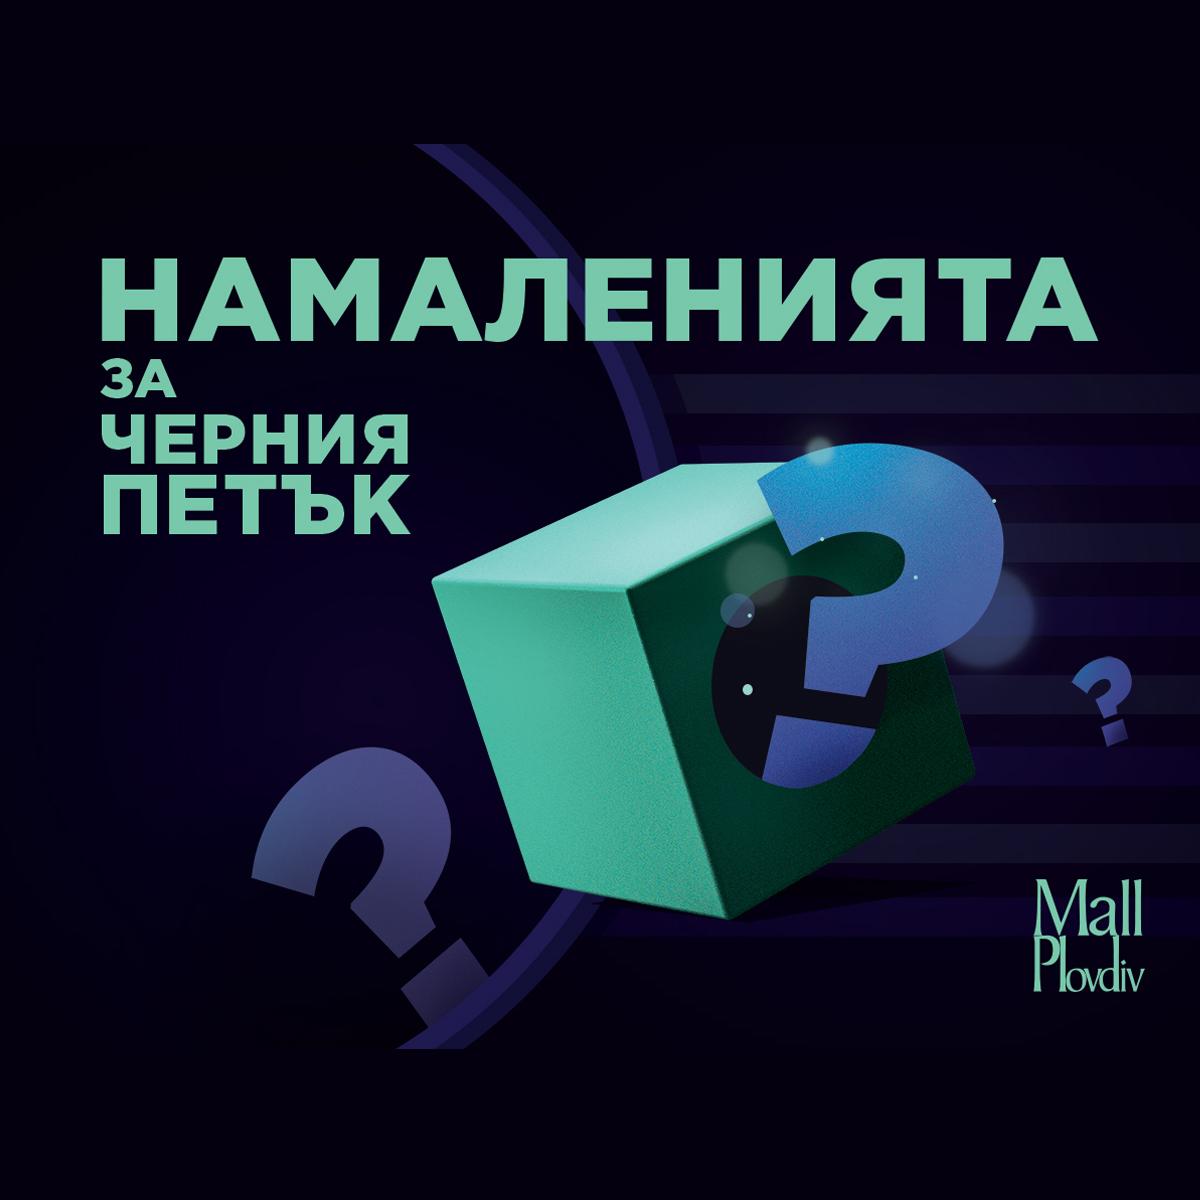 Намаления за BLACK FRIDAY в Mол Пловдив